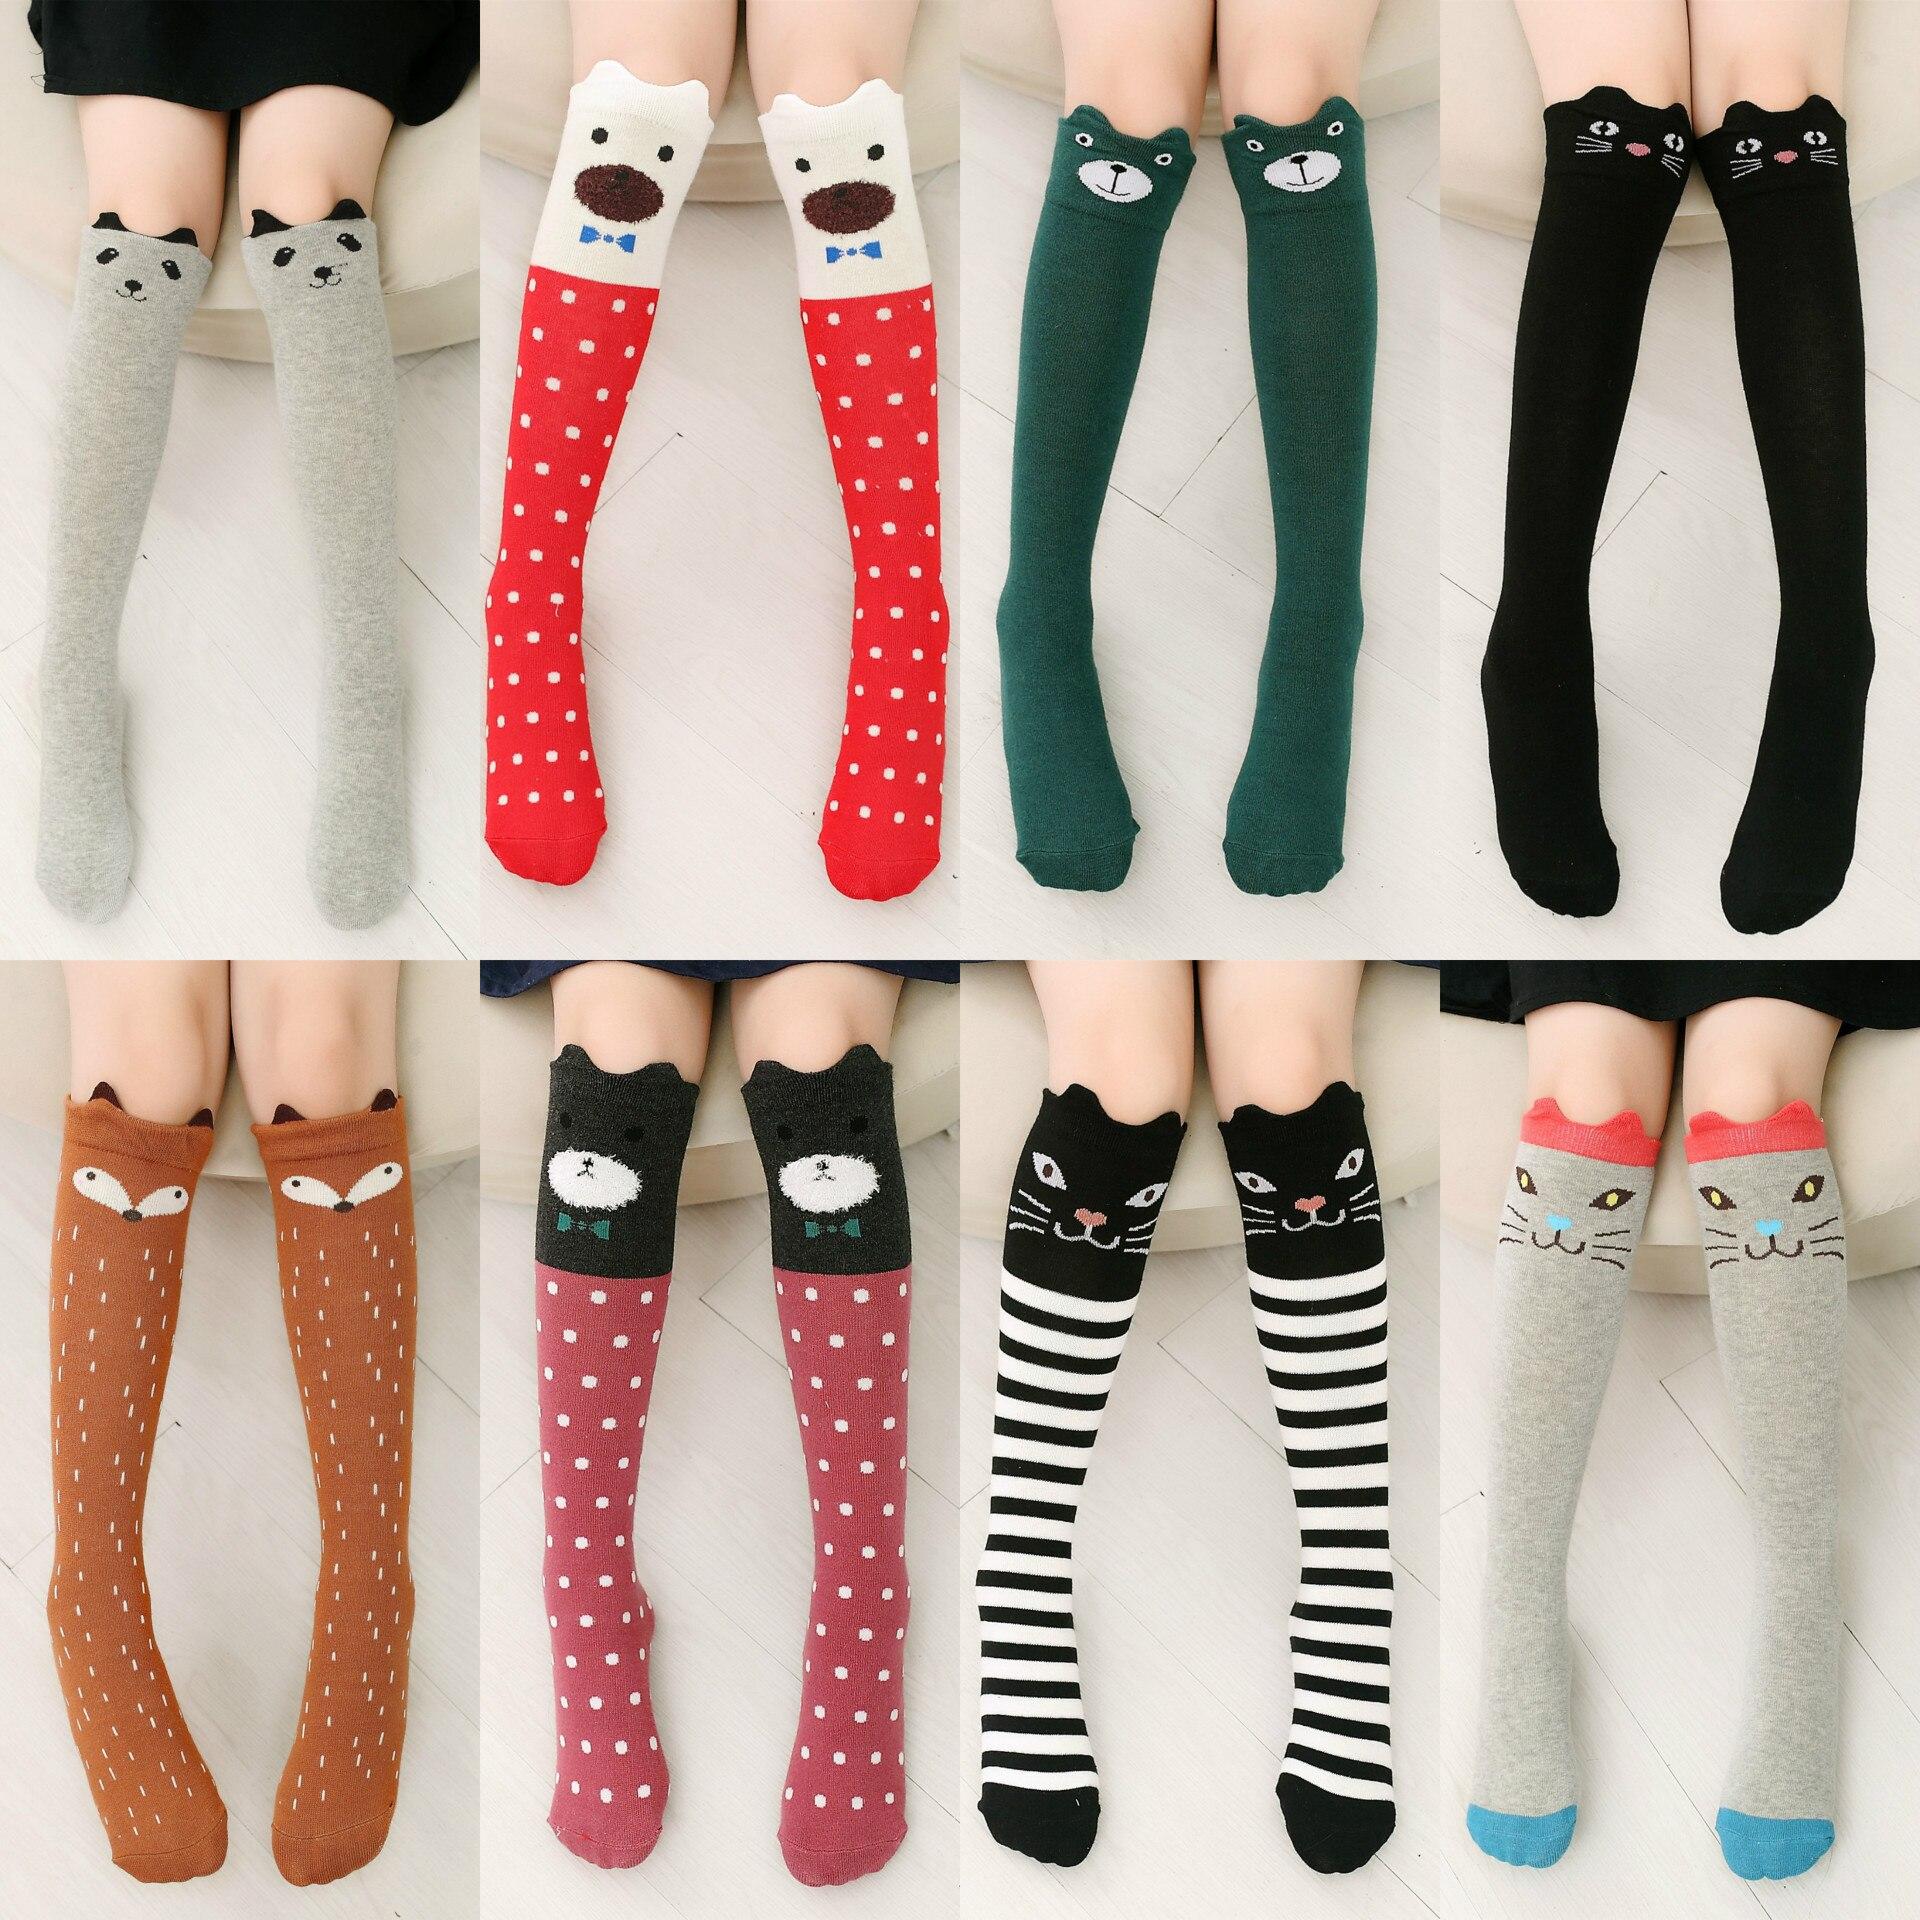 6 Pairs Girls Knee High Socks Cute Cartoon Animal Boot Socks Cotton Socks